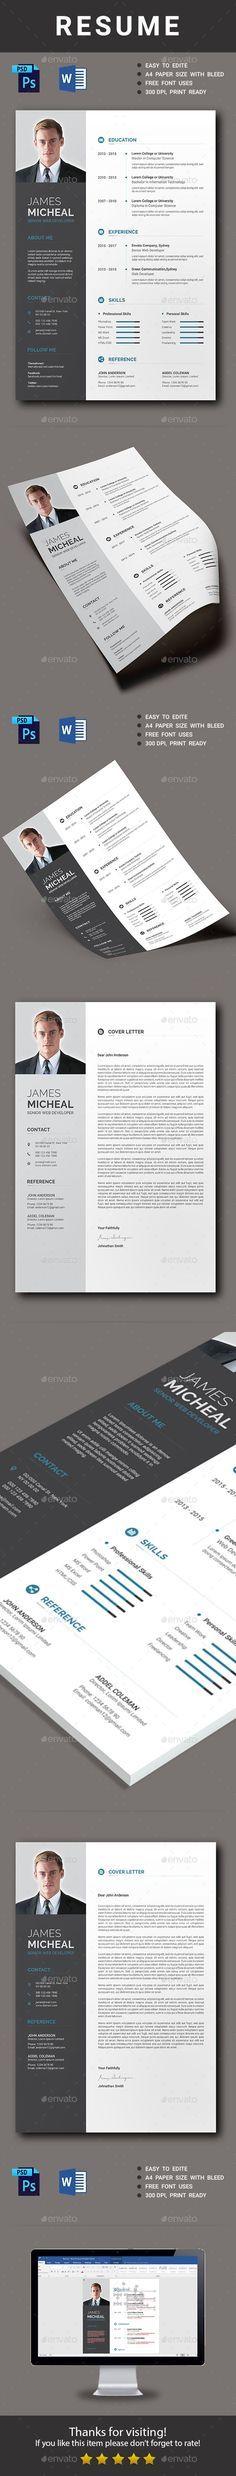 dental hygienist resume objective%0A Resume